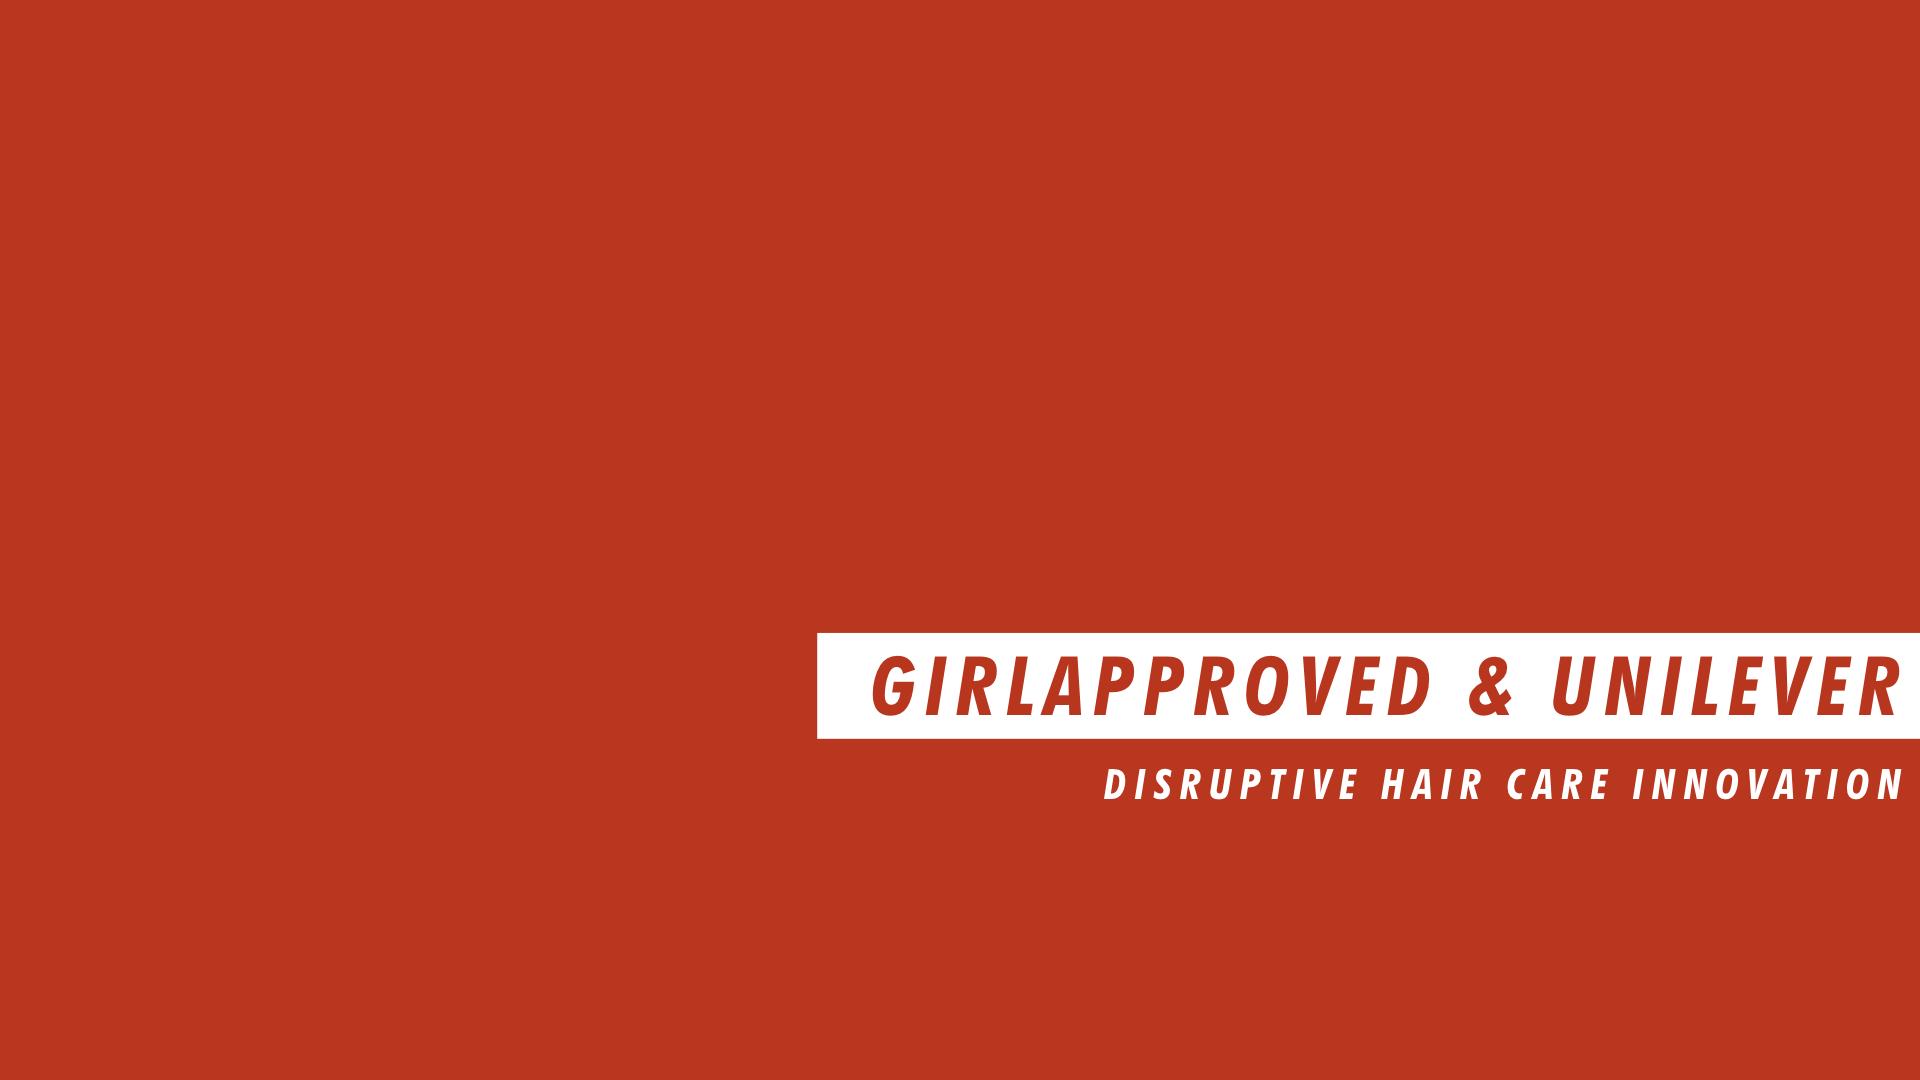 AXE-GIRLAPPROVEE-COVER.001.jpeg